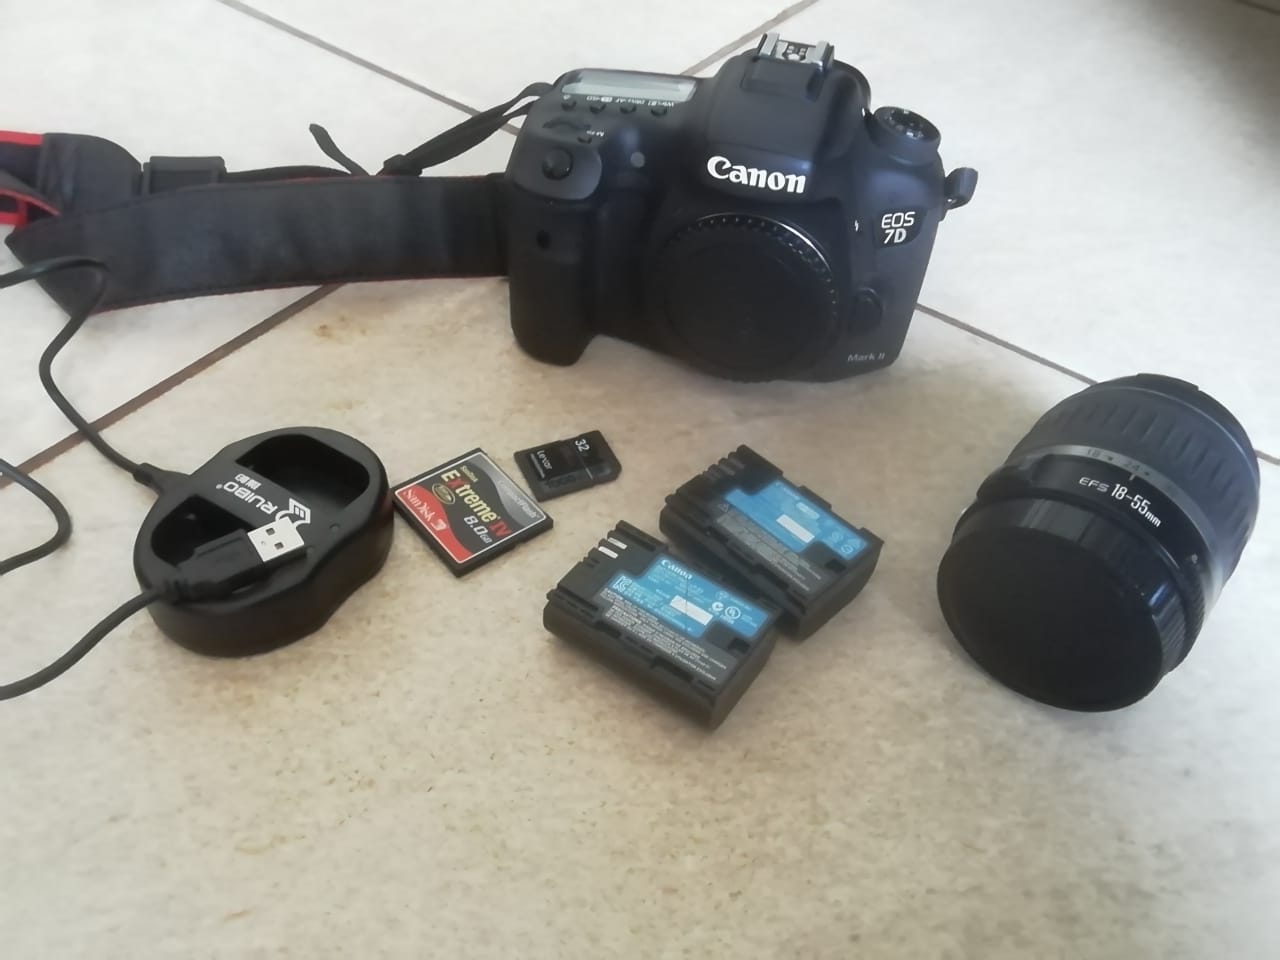 Canon 7d mark ii with 18 - 55 lens etc